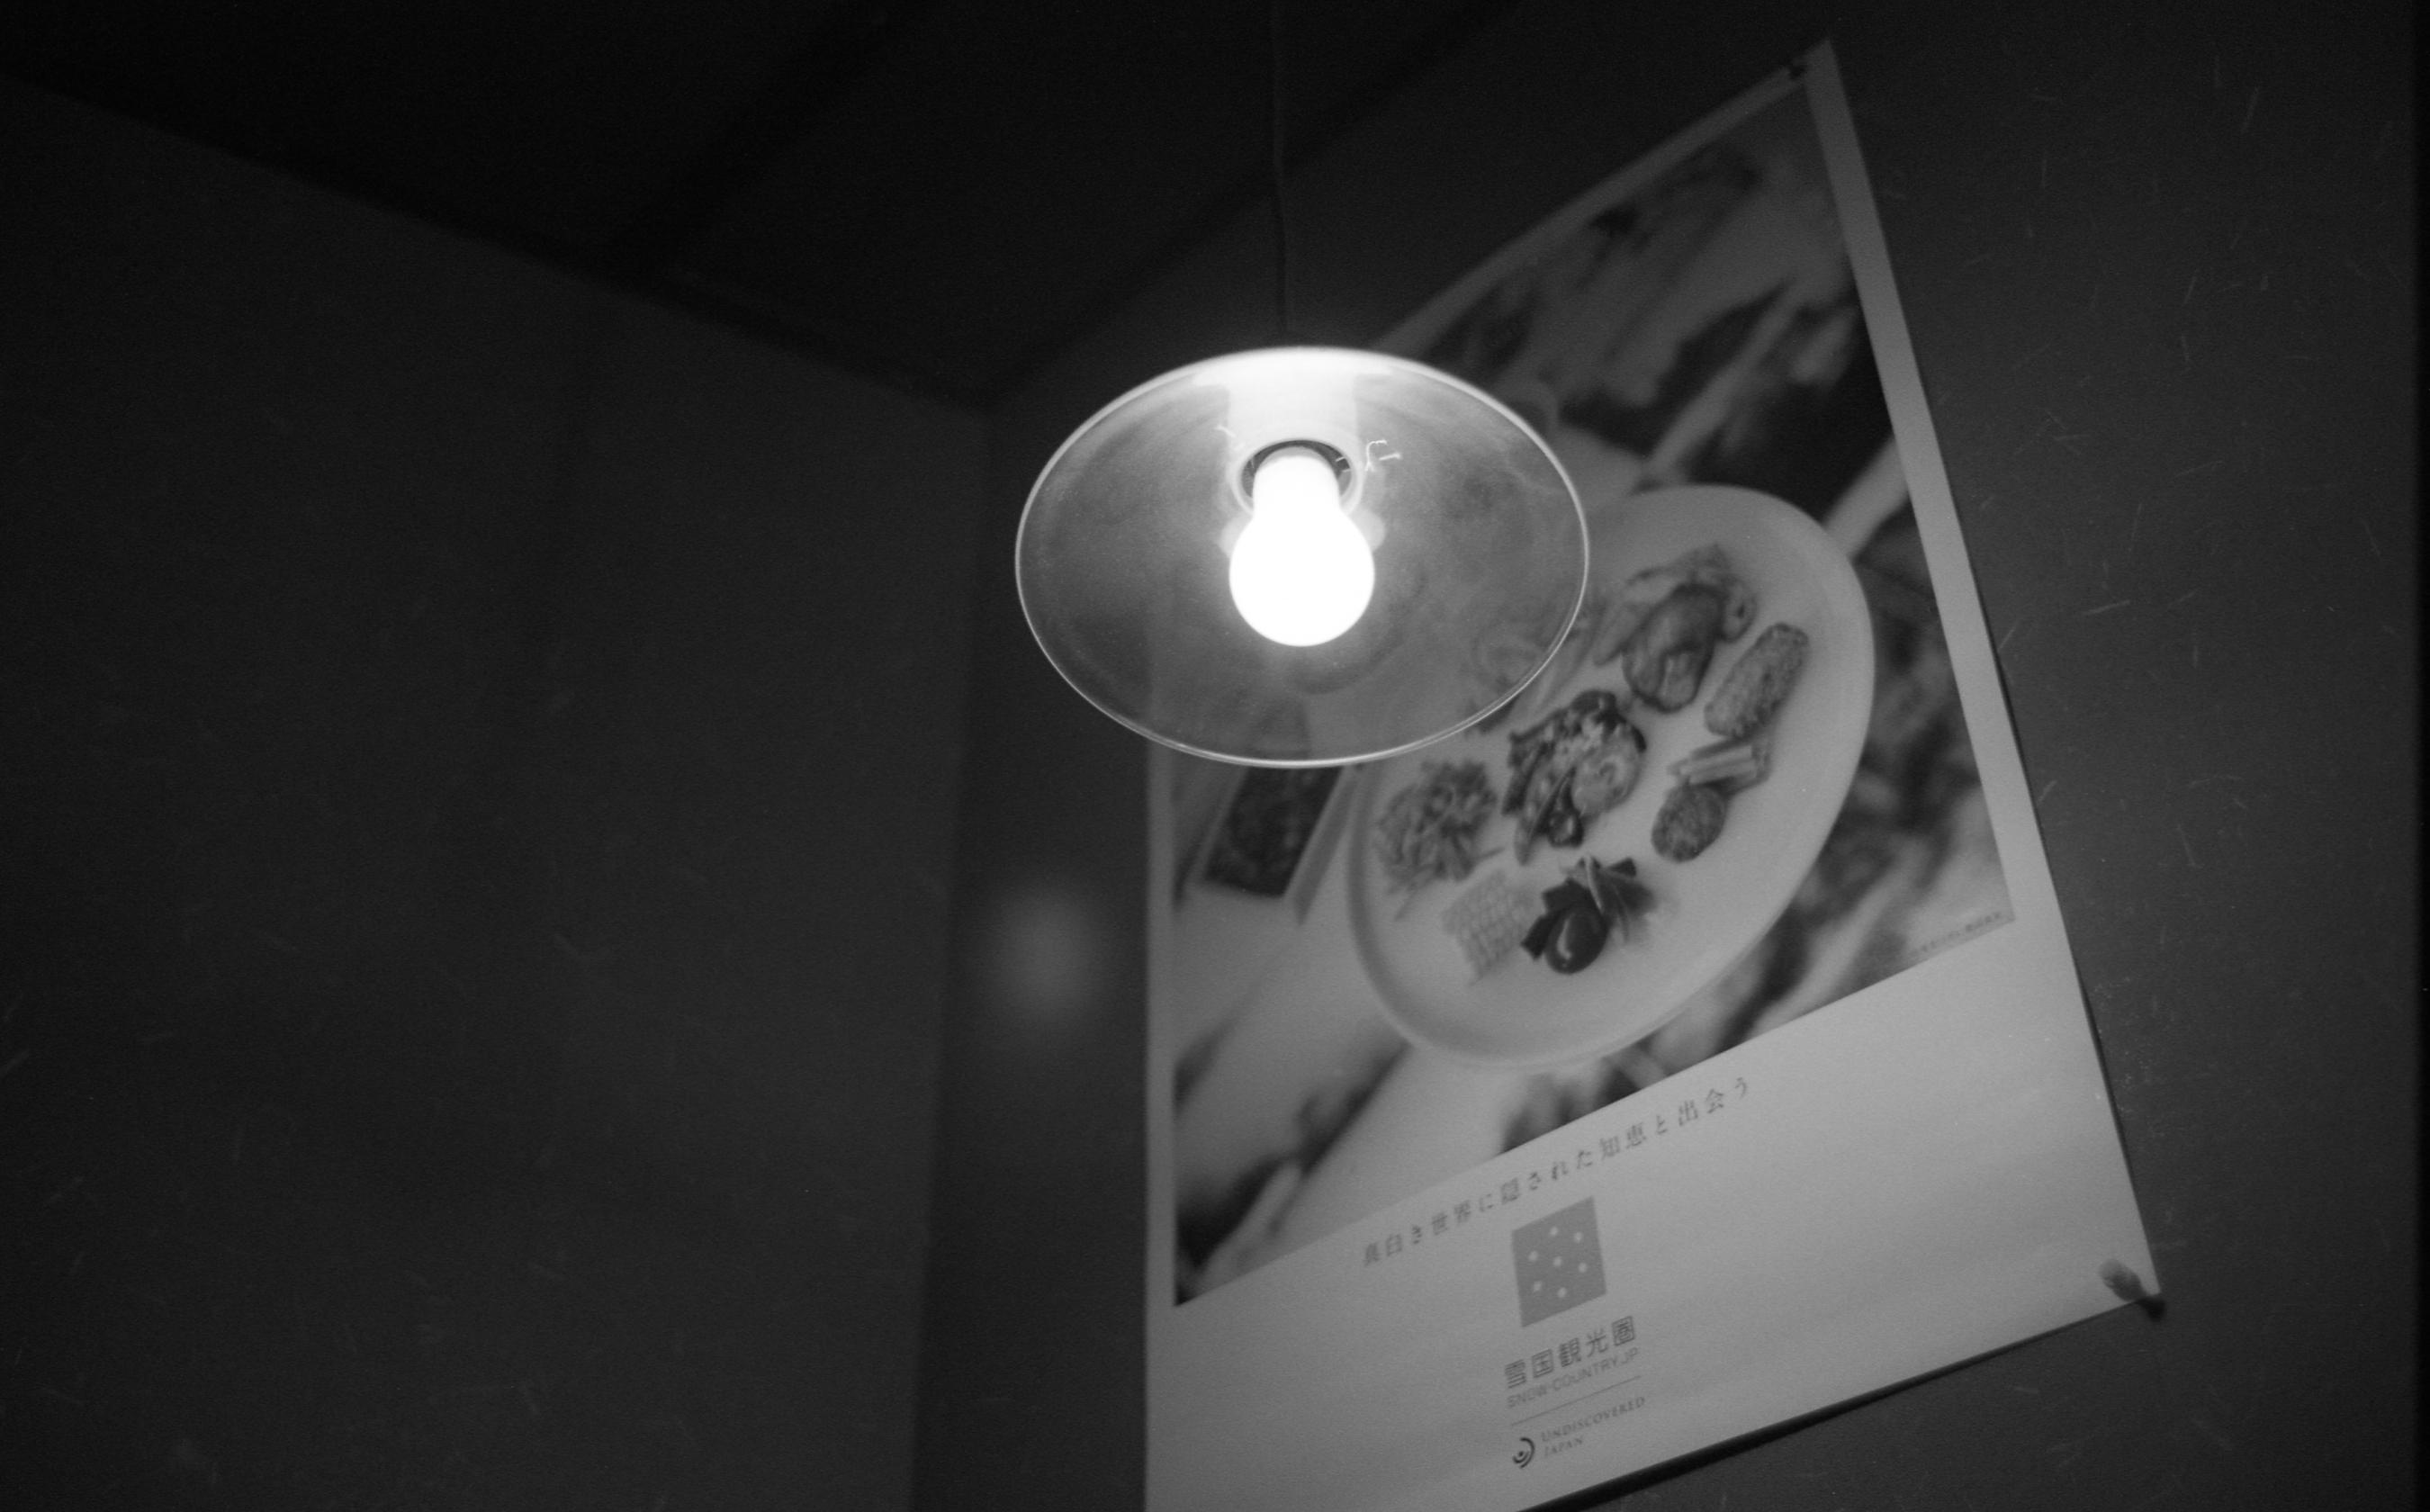 f:id:aoyama-takuro:20190103220921j:plain